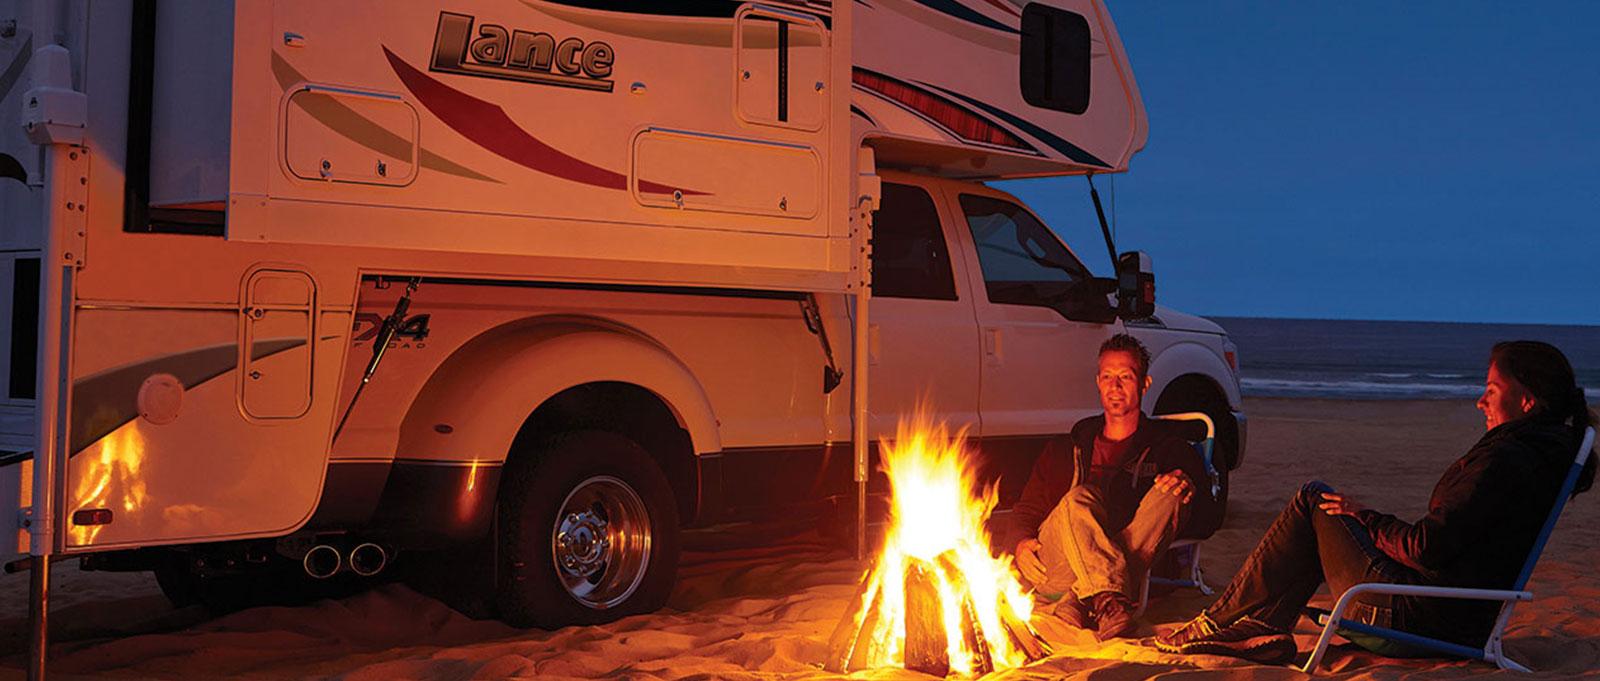 Lance Camper & Travel Trailers for Sale | RV Dealer in Southern CA